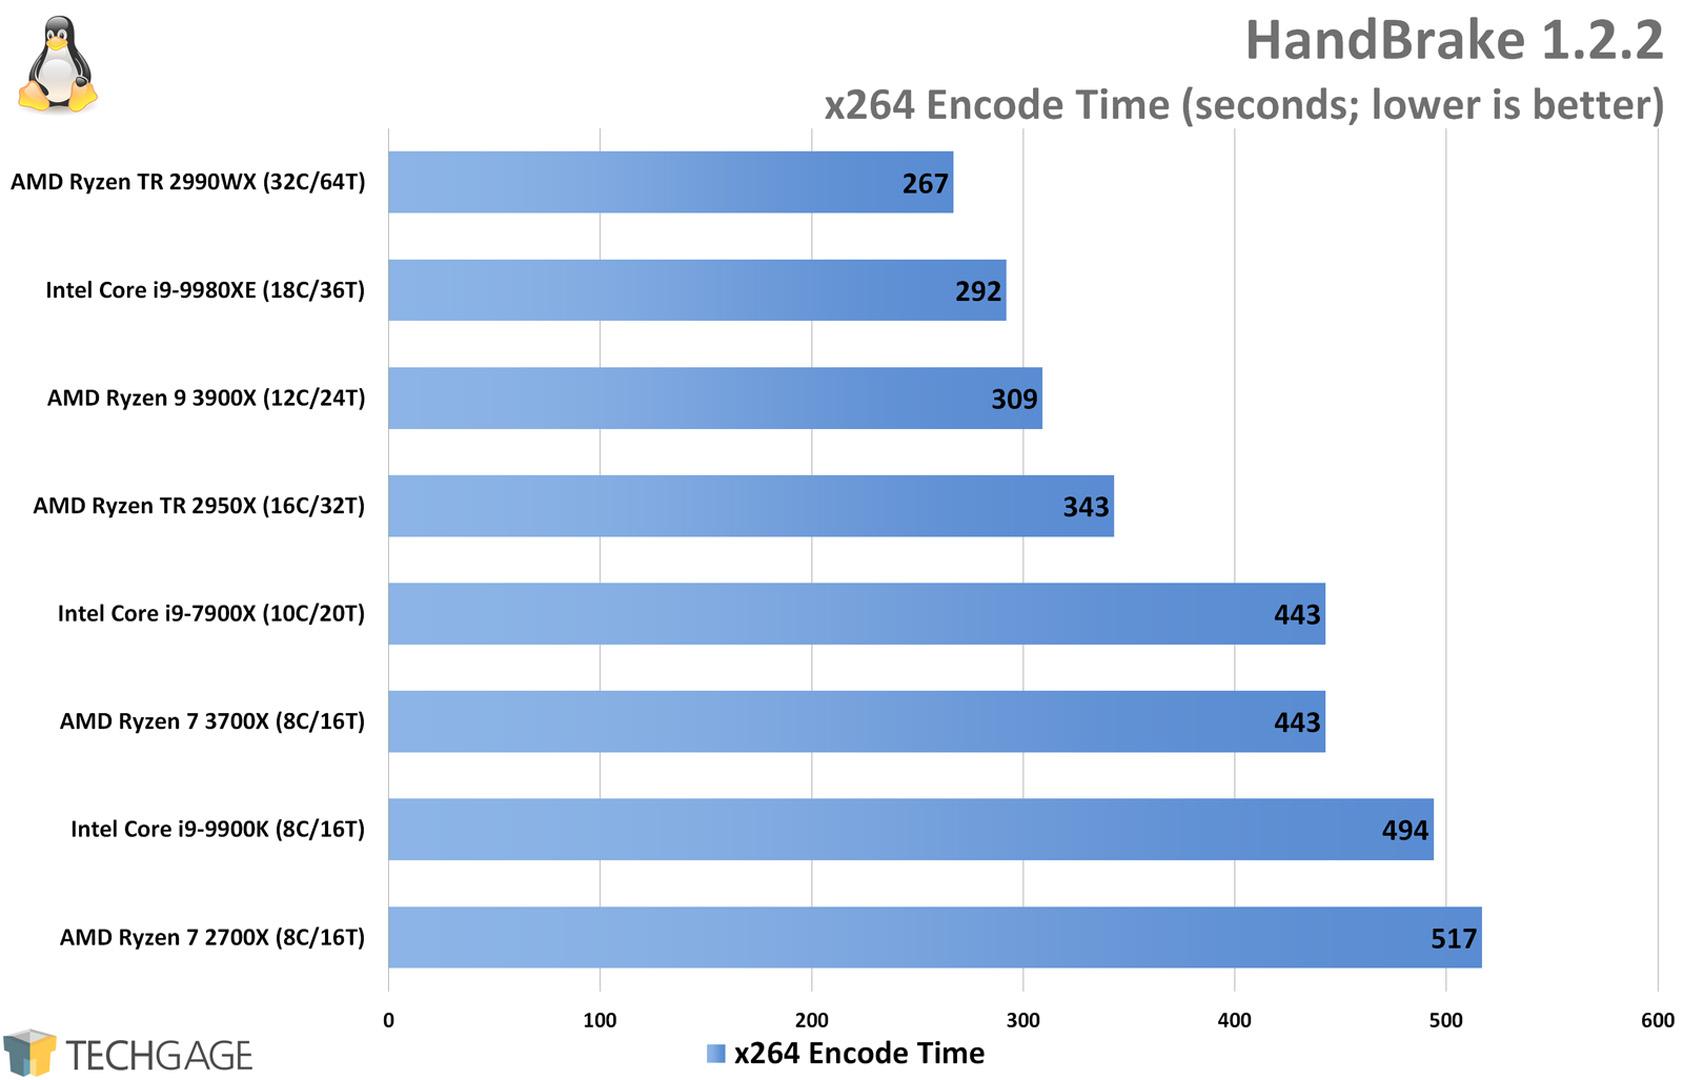 HandBrake x264 Encode Performance (Linux, AMD Ryzen 9 3900X and 7 3700X)